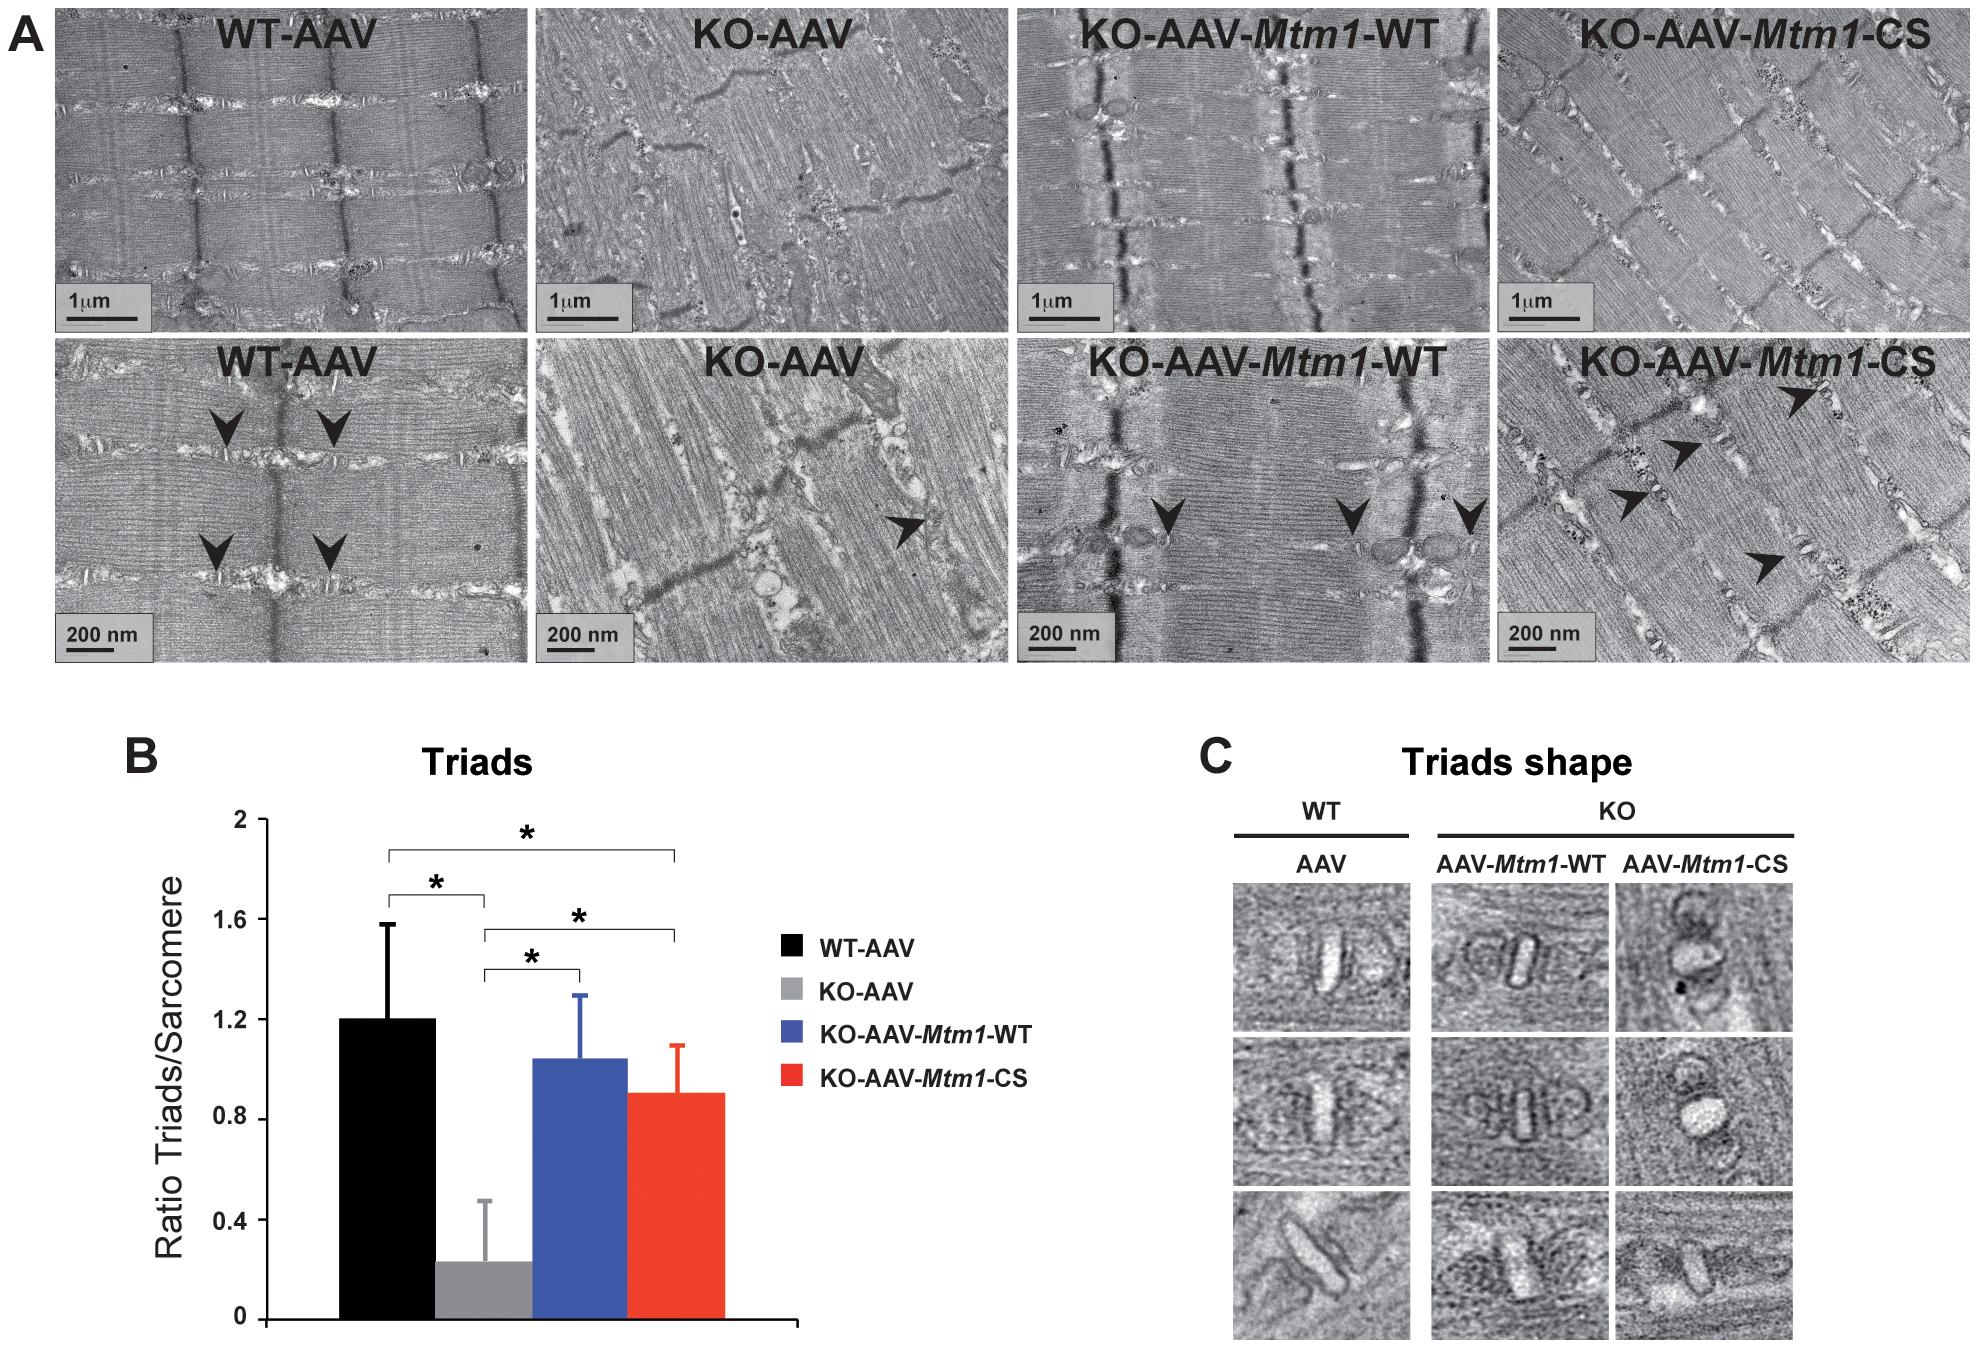 Improvement of triad abnormalities present in <i>Mtm1</i>-deficient muscles with AAV-<i>Mtm1</i>-WT and AAV-<i>Mtm1</i>-CS.